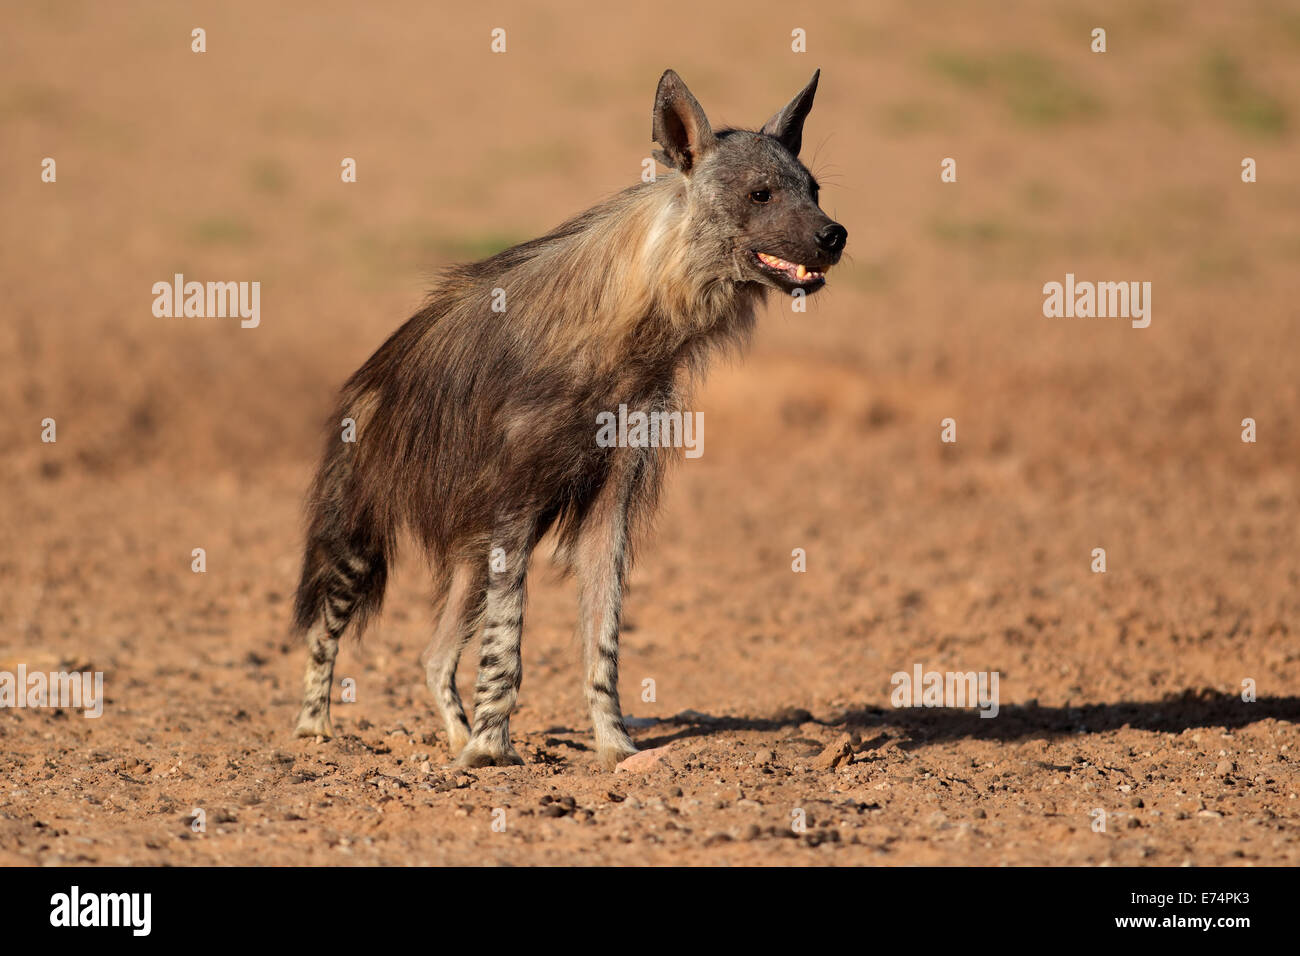 Alert Braune Hyäne (zerbeissen Brunnea), Kalahari-Wüste, Südafrika Stockbild